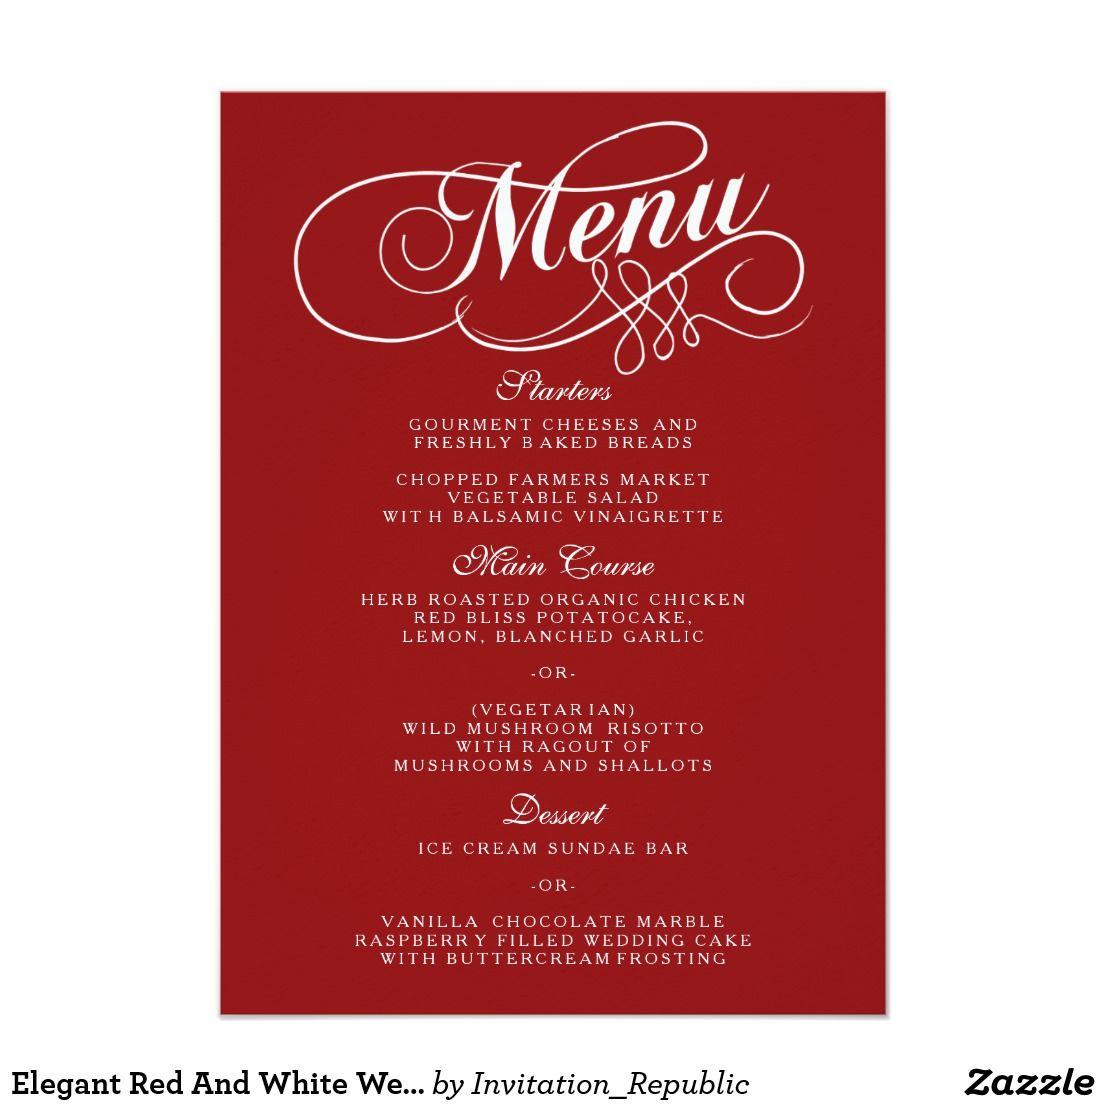 Elegant Red And White Wedding Menu Templates   Elegant Wedding ...